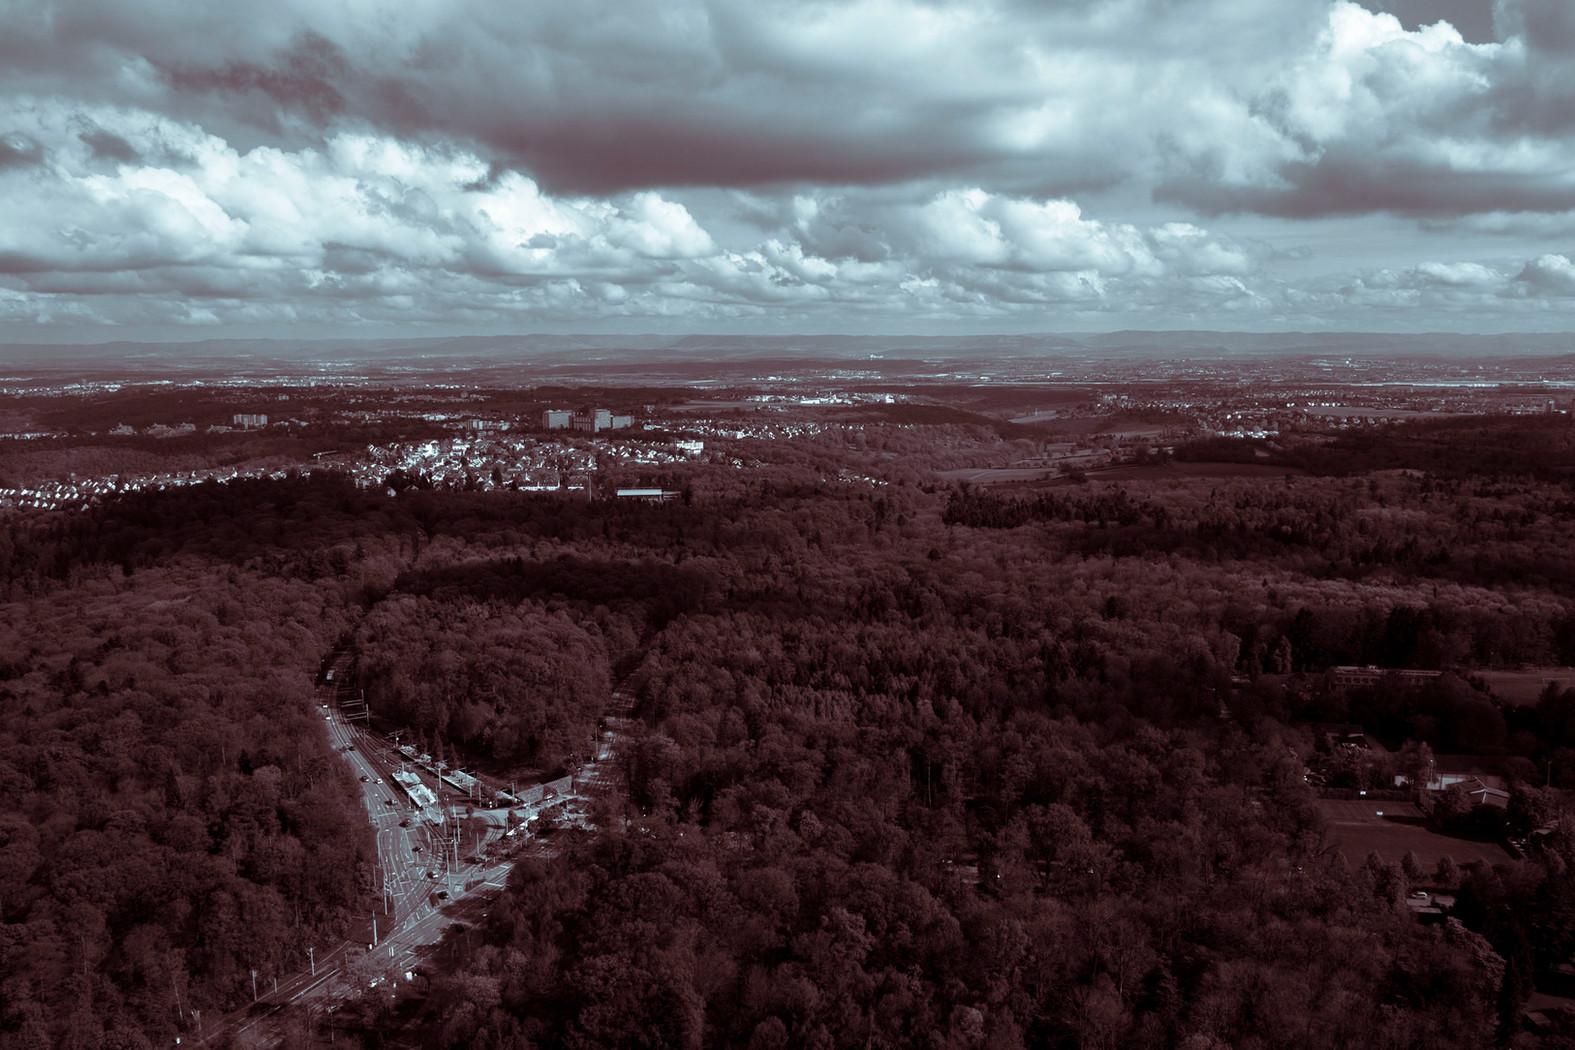 2017-05-03_Fernsehturm-2.jpg